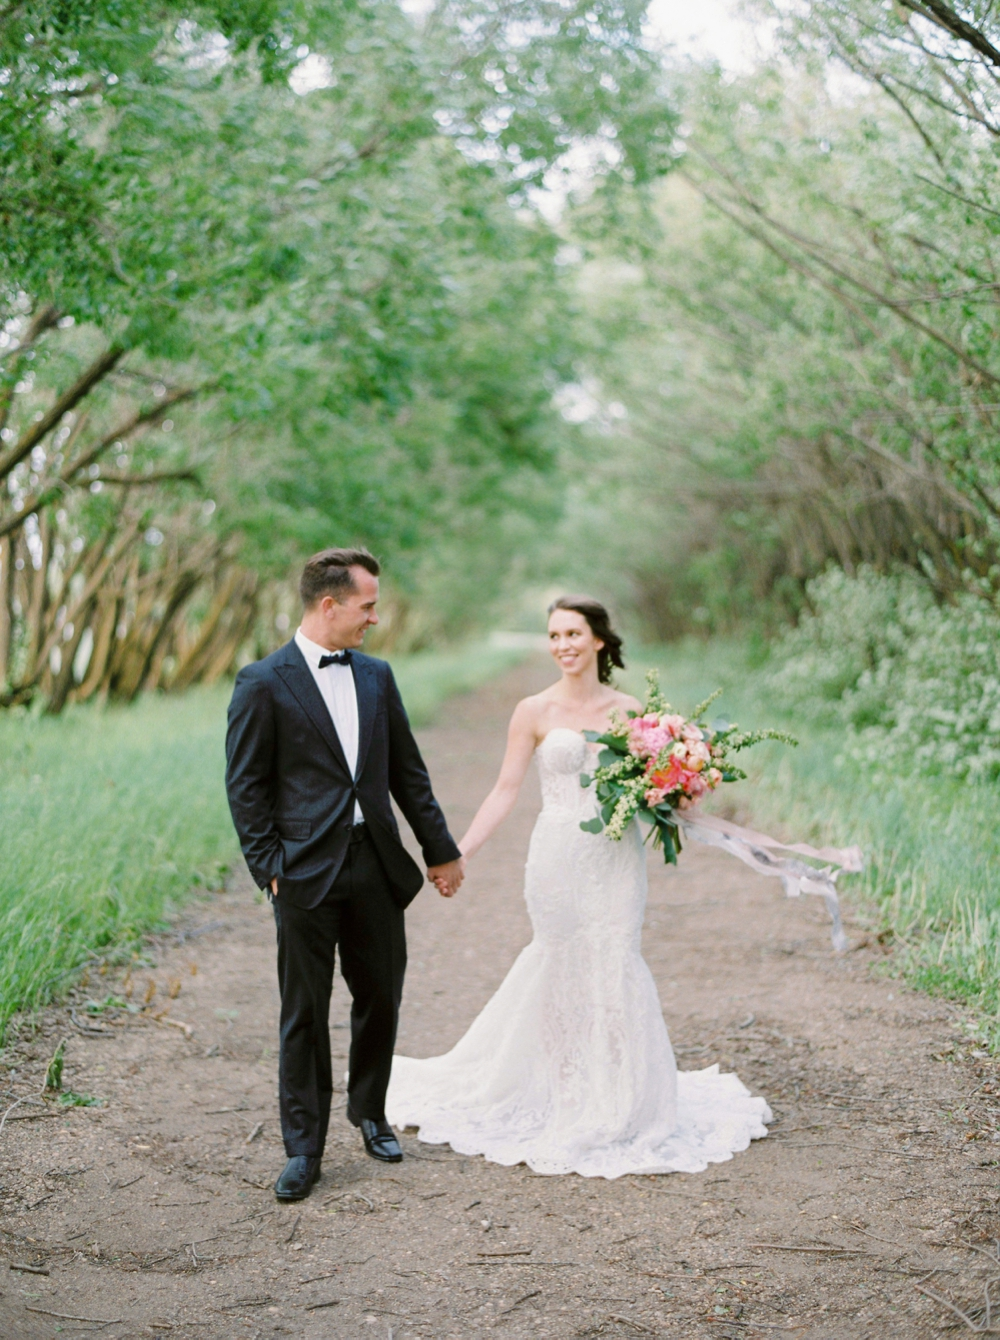 Edmonton wedding photographers | stunning overhanging tree location | pink bridal bouquet | galia lahav wedding dress inspiration | Justine Milton fine art film wedding photographers